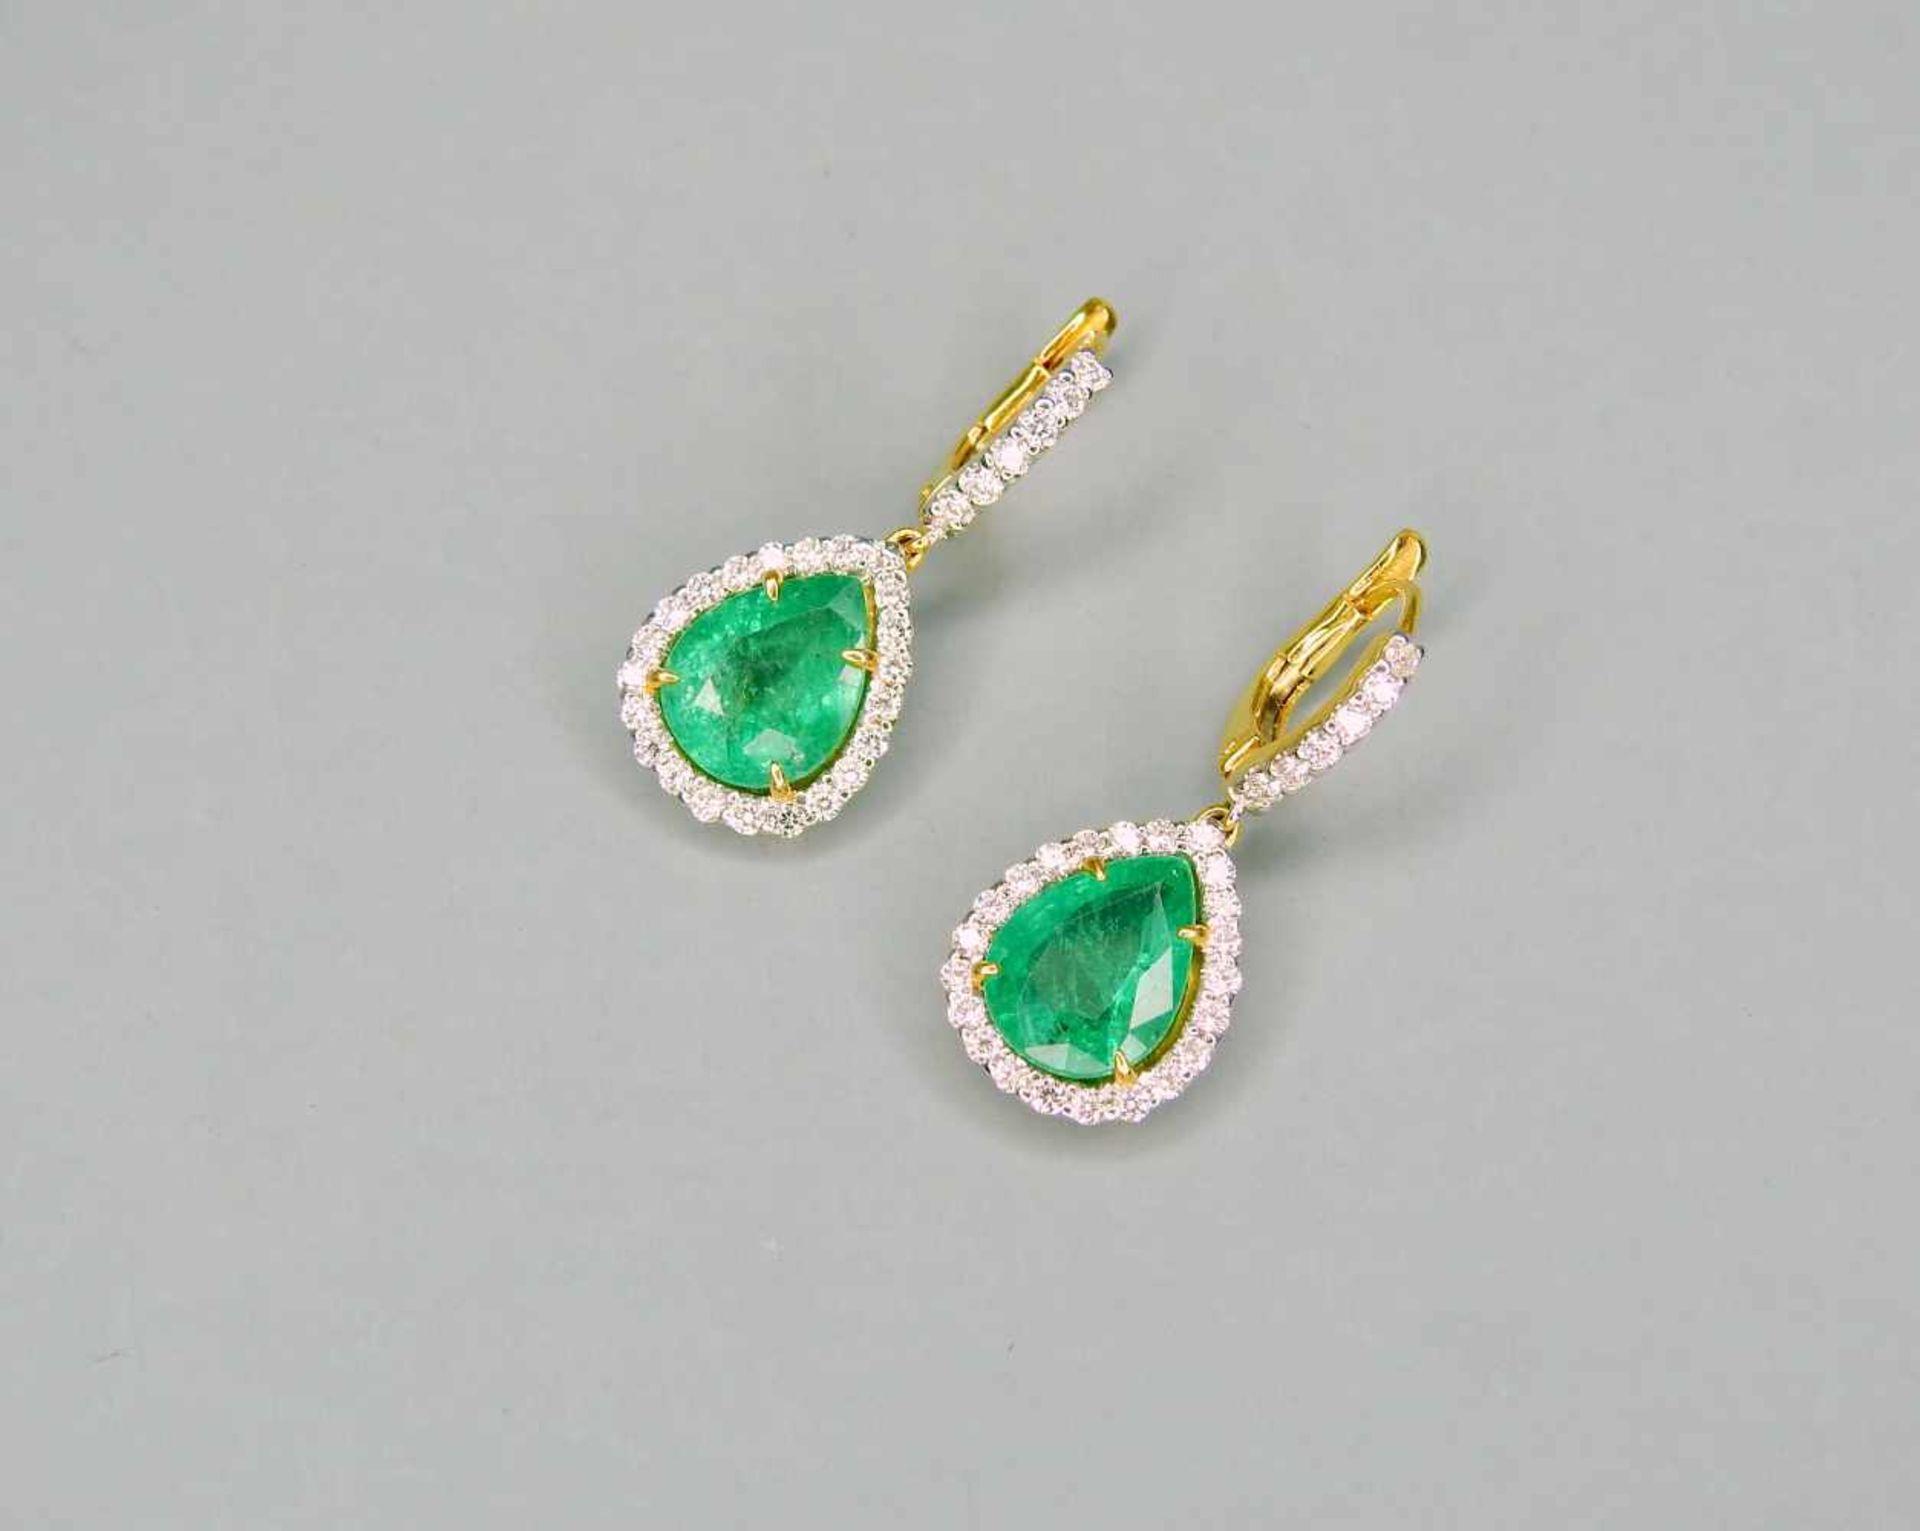 Edle Smaragd-Ohrringe18 K Gelbgold. Qualitative, elegante Ohrringe mit kolumbianischen